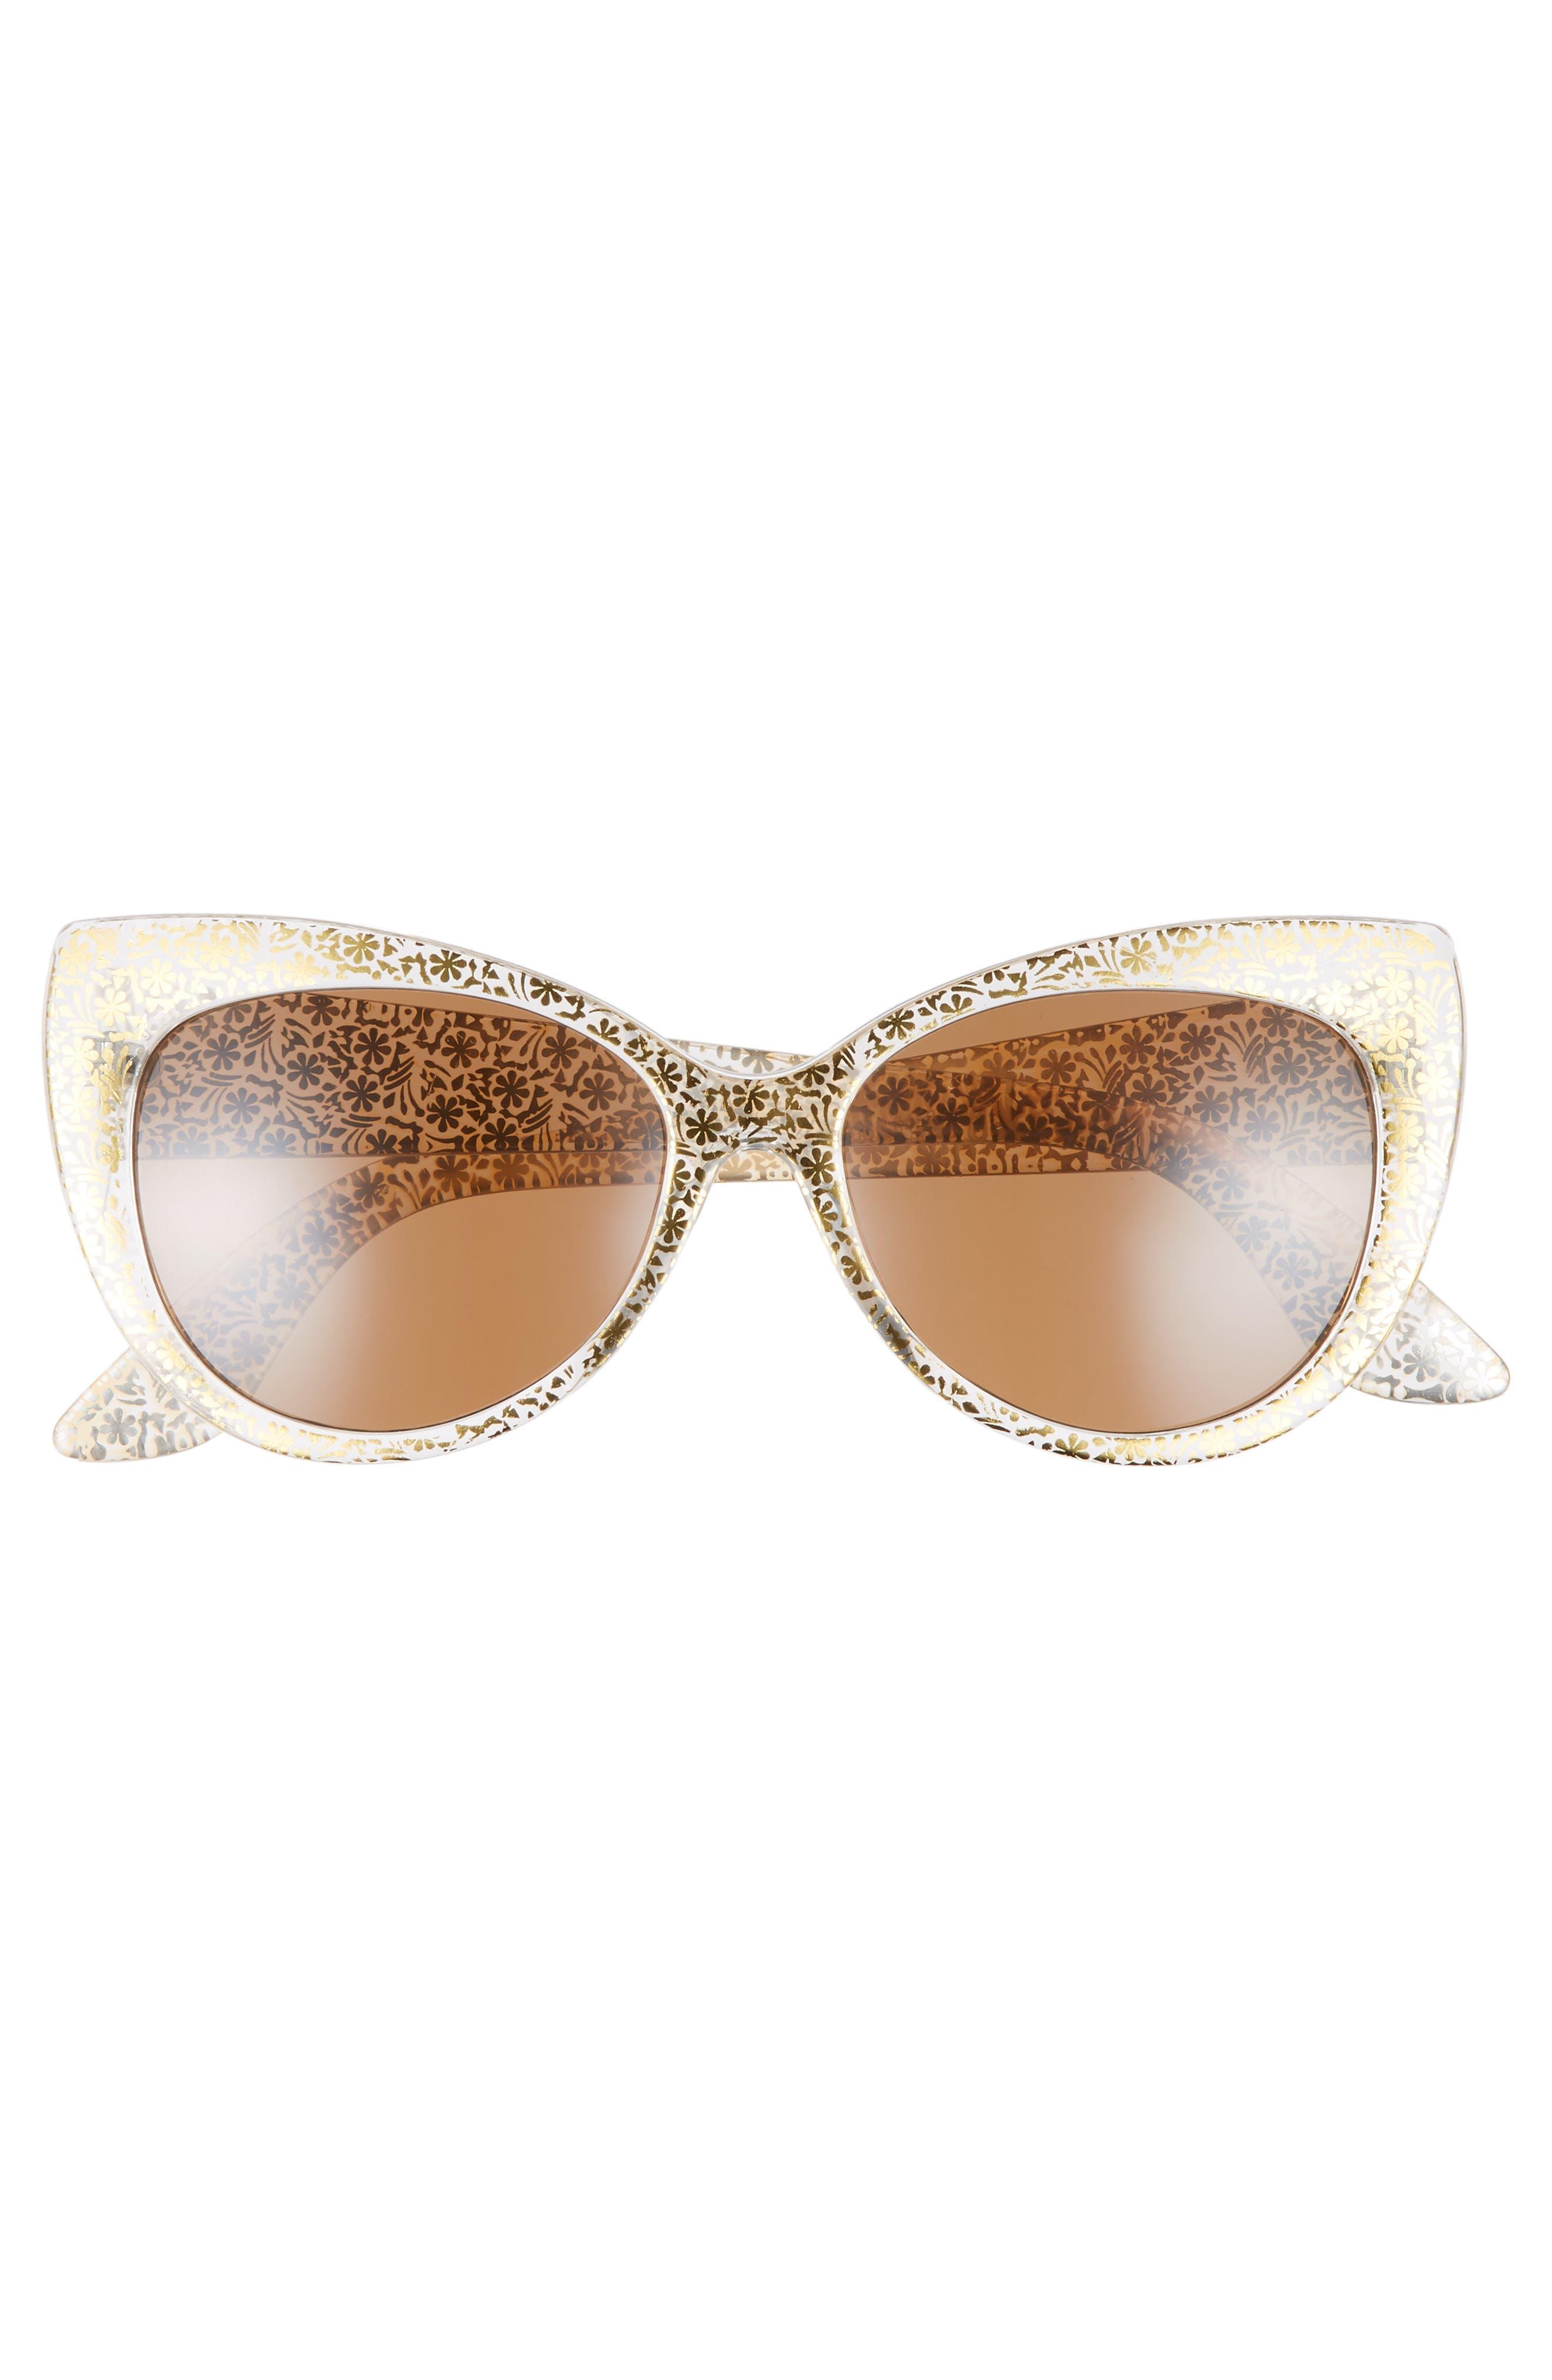 55mm Floral Cat Eye Sunglasses,                             Alternate thumbnail 6, color,